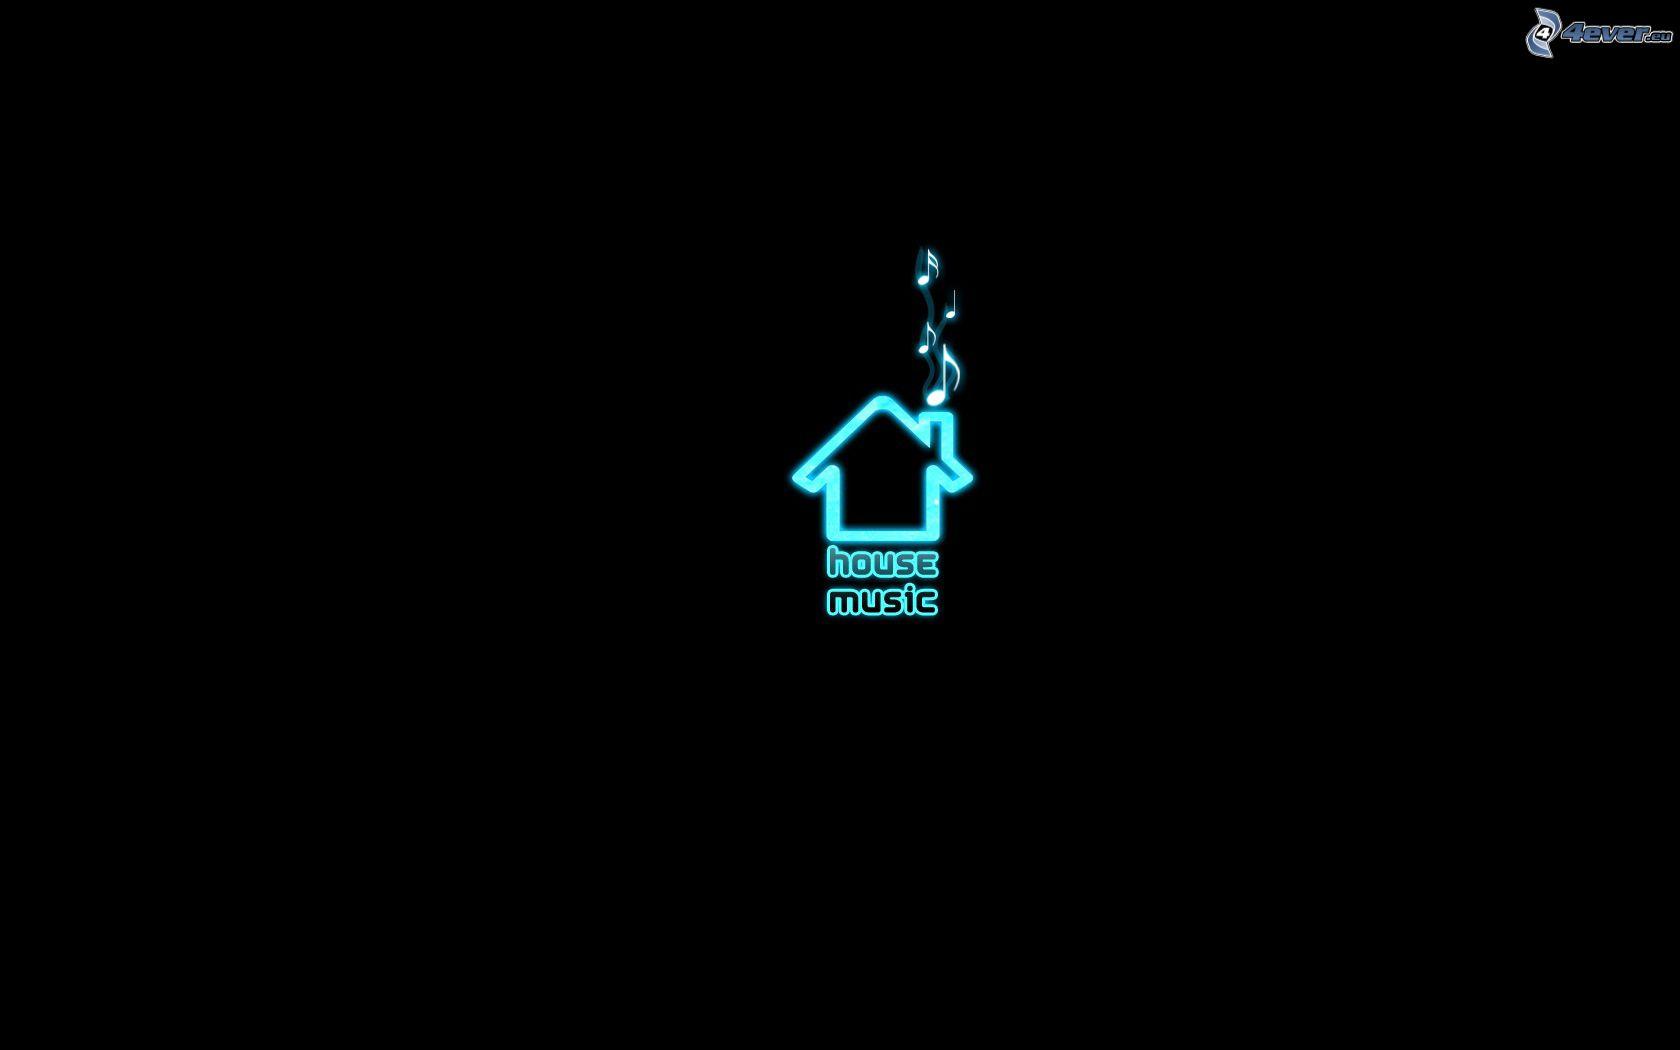 House music 1680x1050